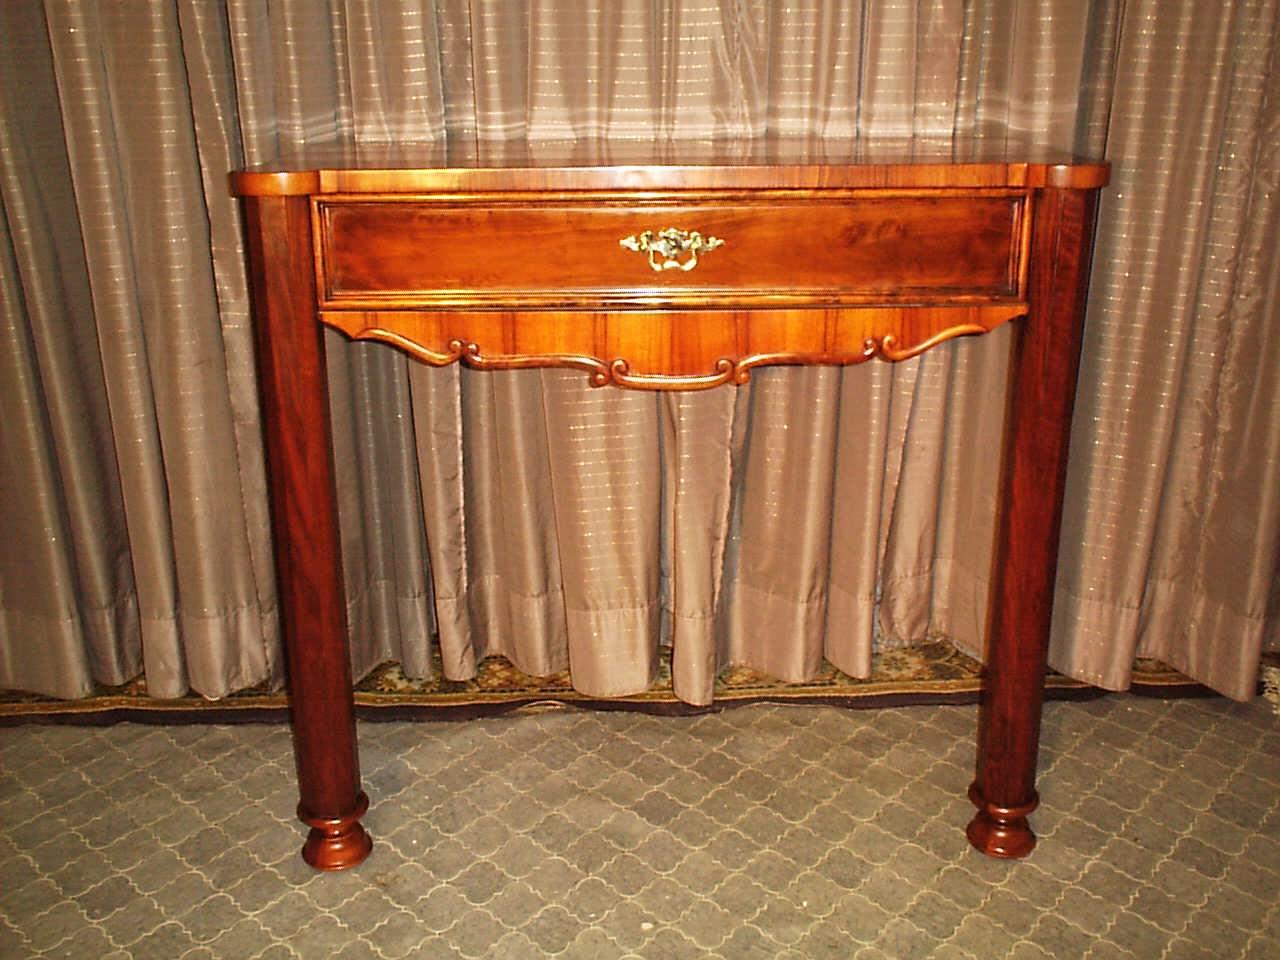 nussbaum konsole antike m bel antiquit ten restauration bracciali m nchen. Black Bedroom Furniture Sets. Home Design Ideas